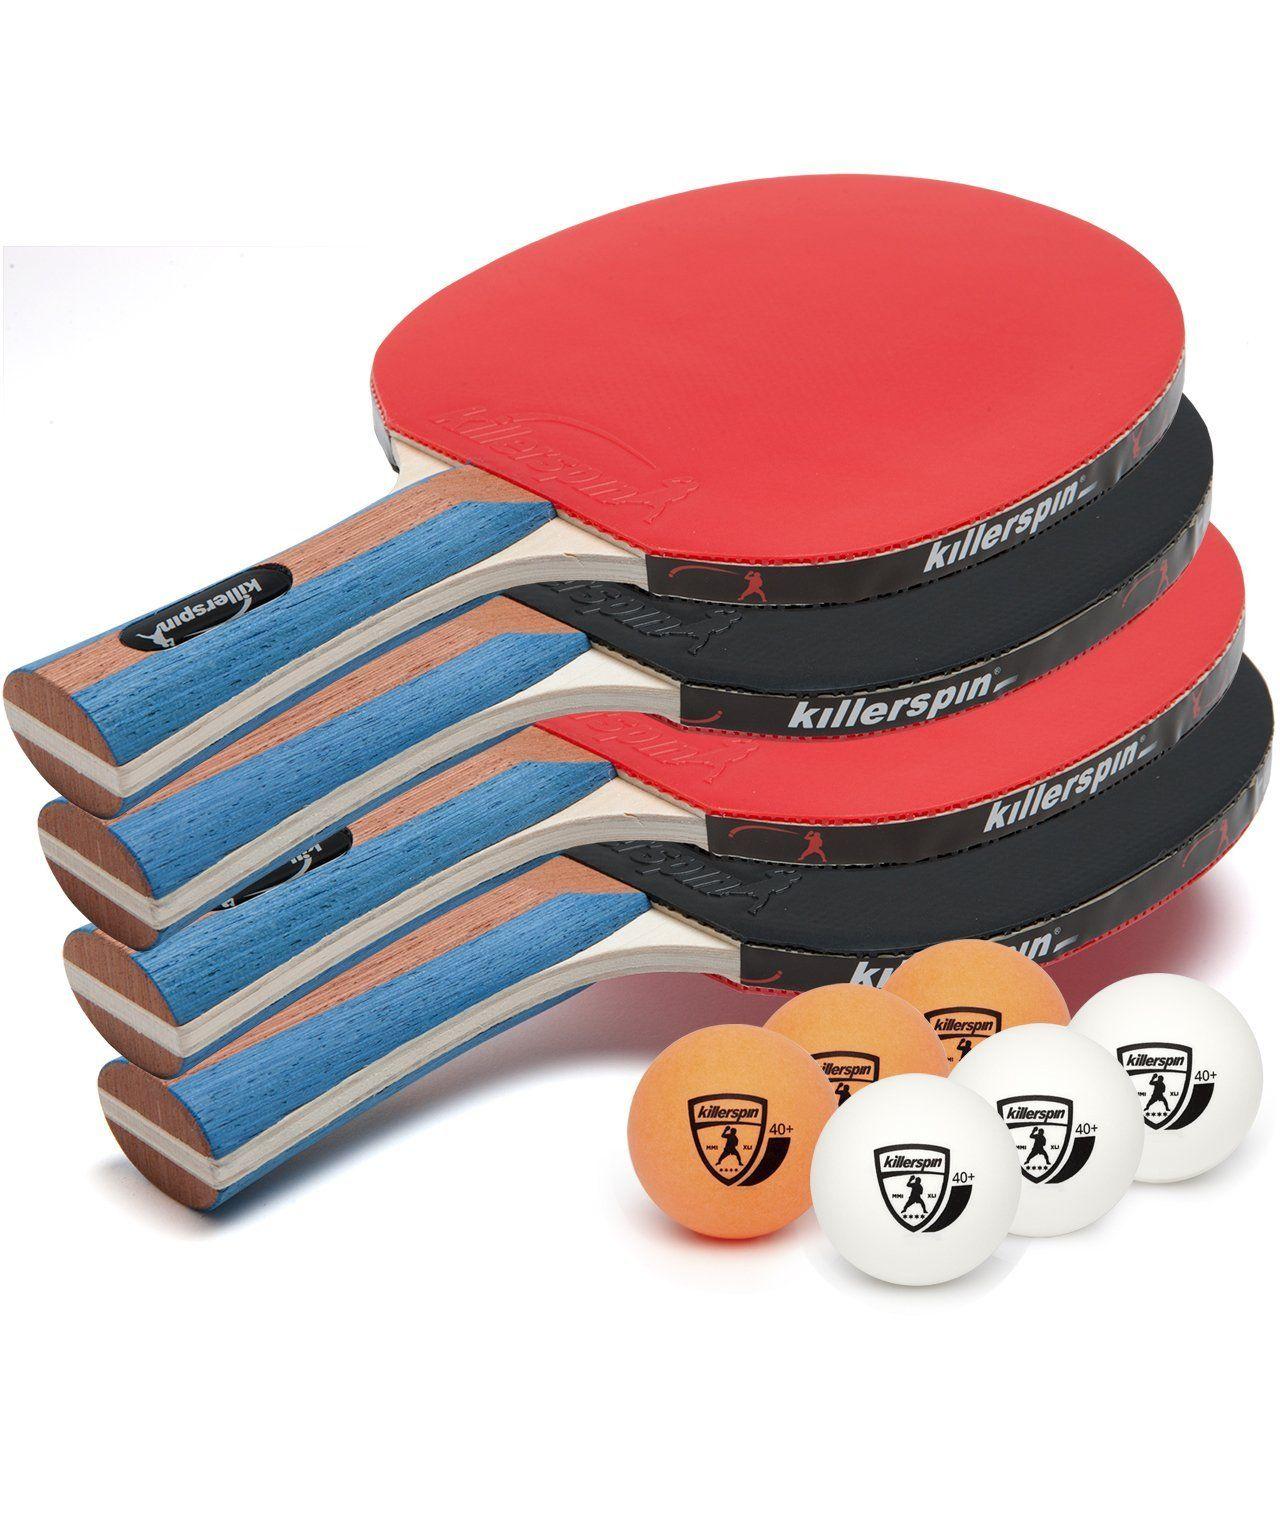 Killerspin JETSET 2 Premium Ping Pong Table Tennis Paddle Pack